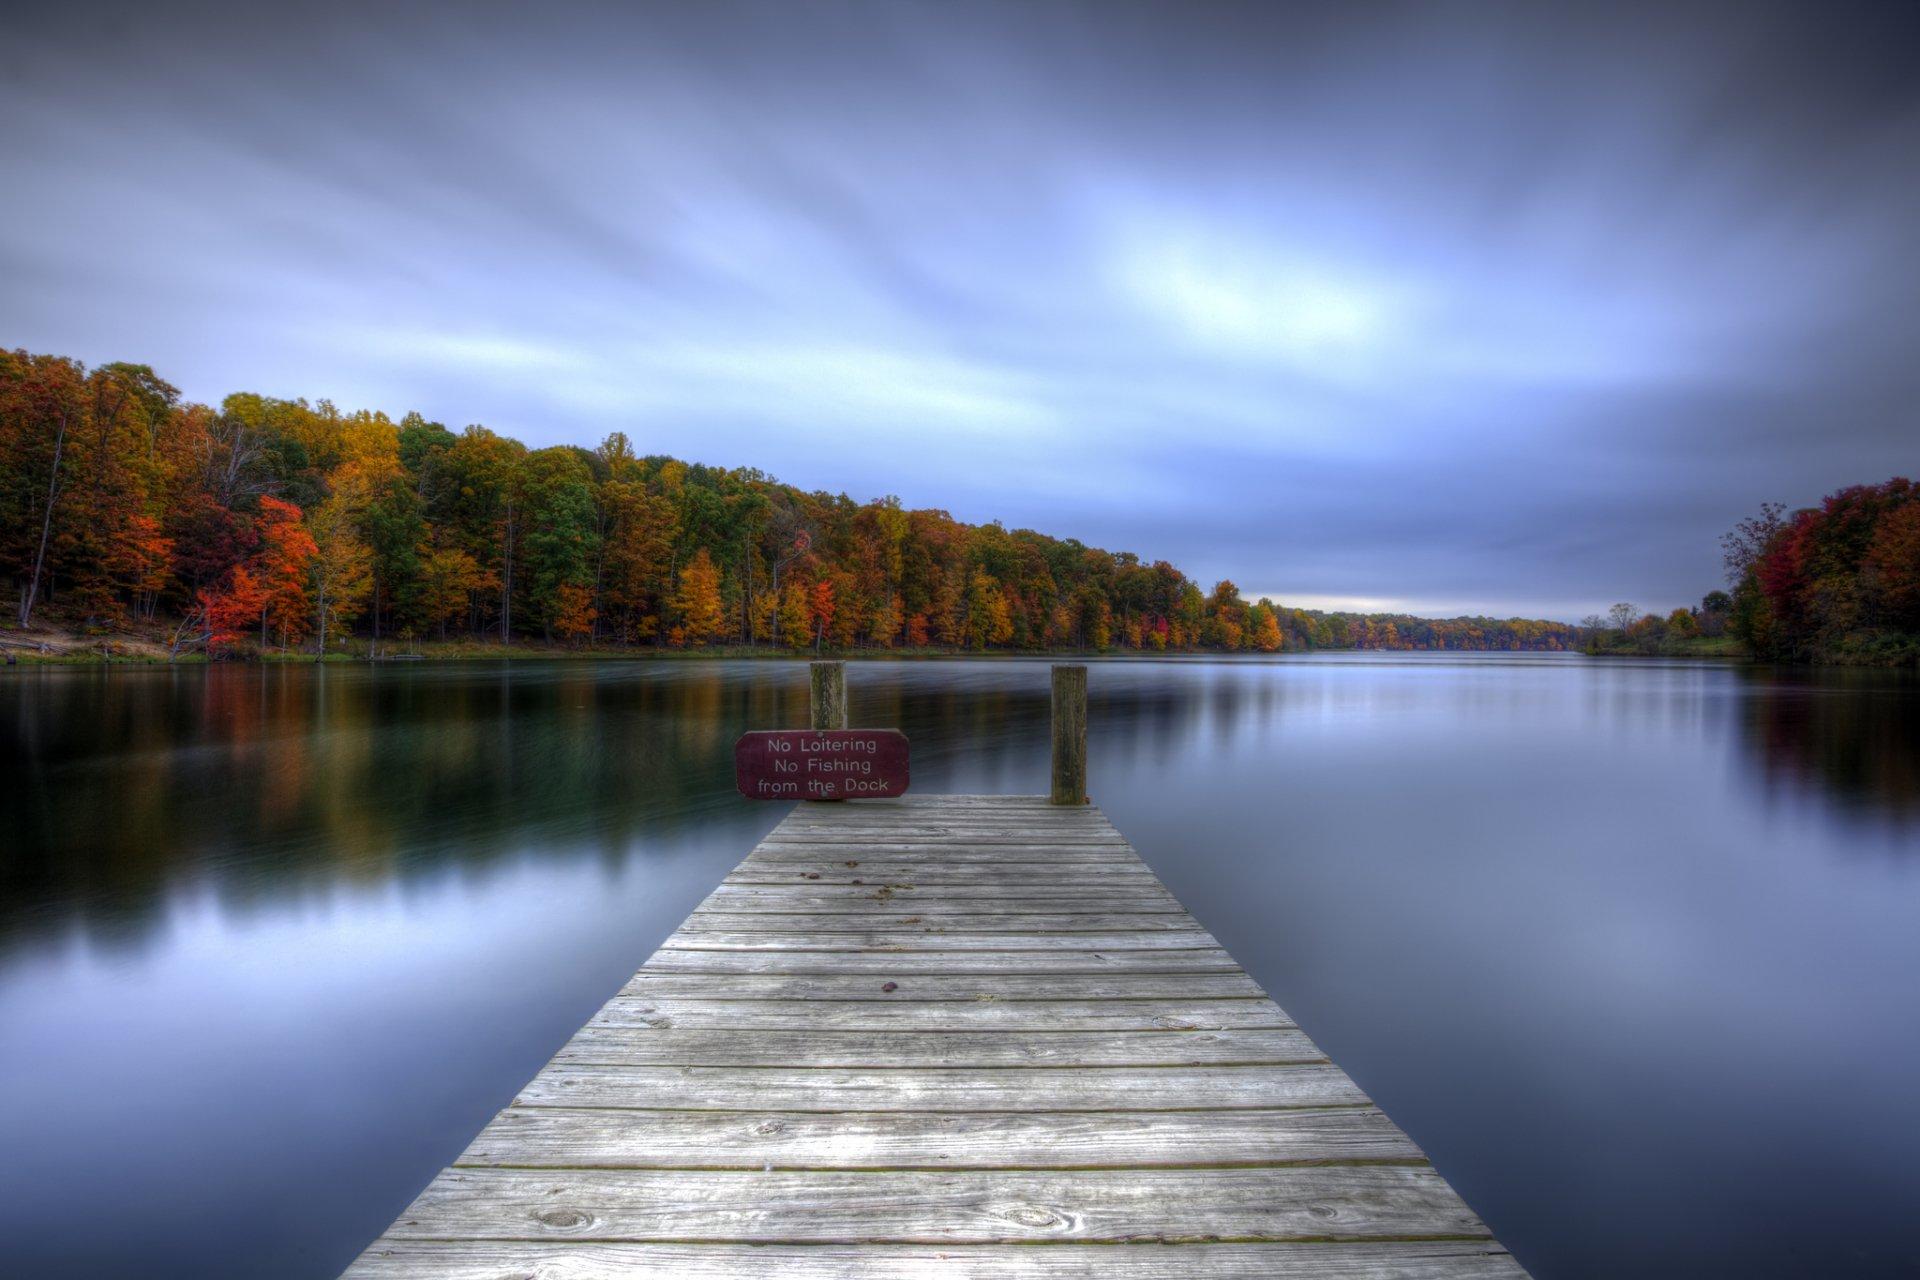 Man Made - Pier  Reflection Dock Lake Tree Fall Foliage Colorful Wallpaper